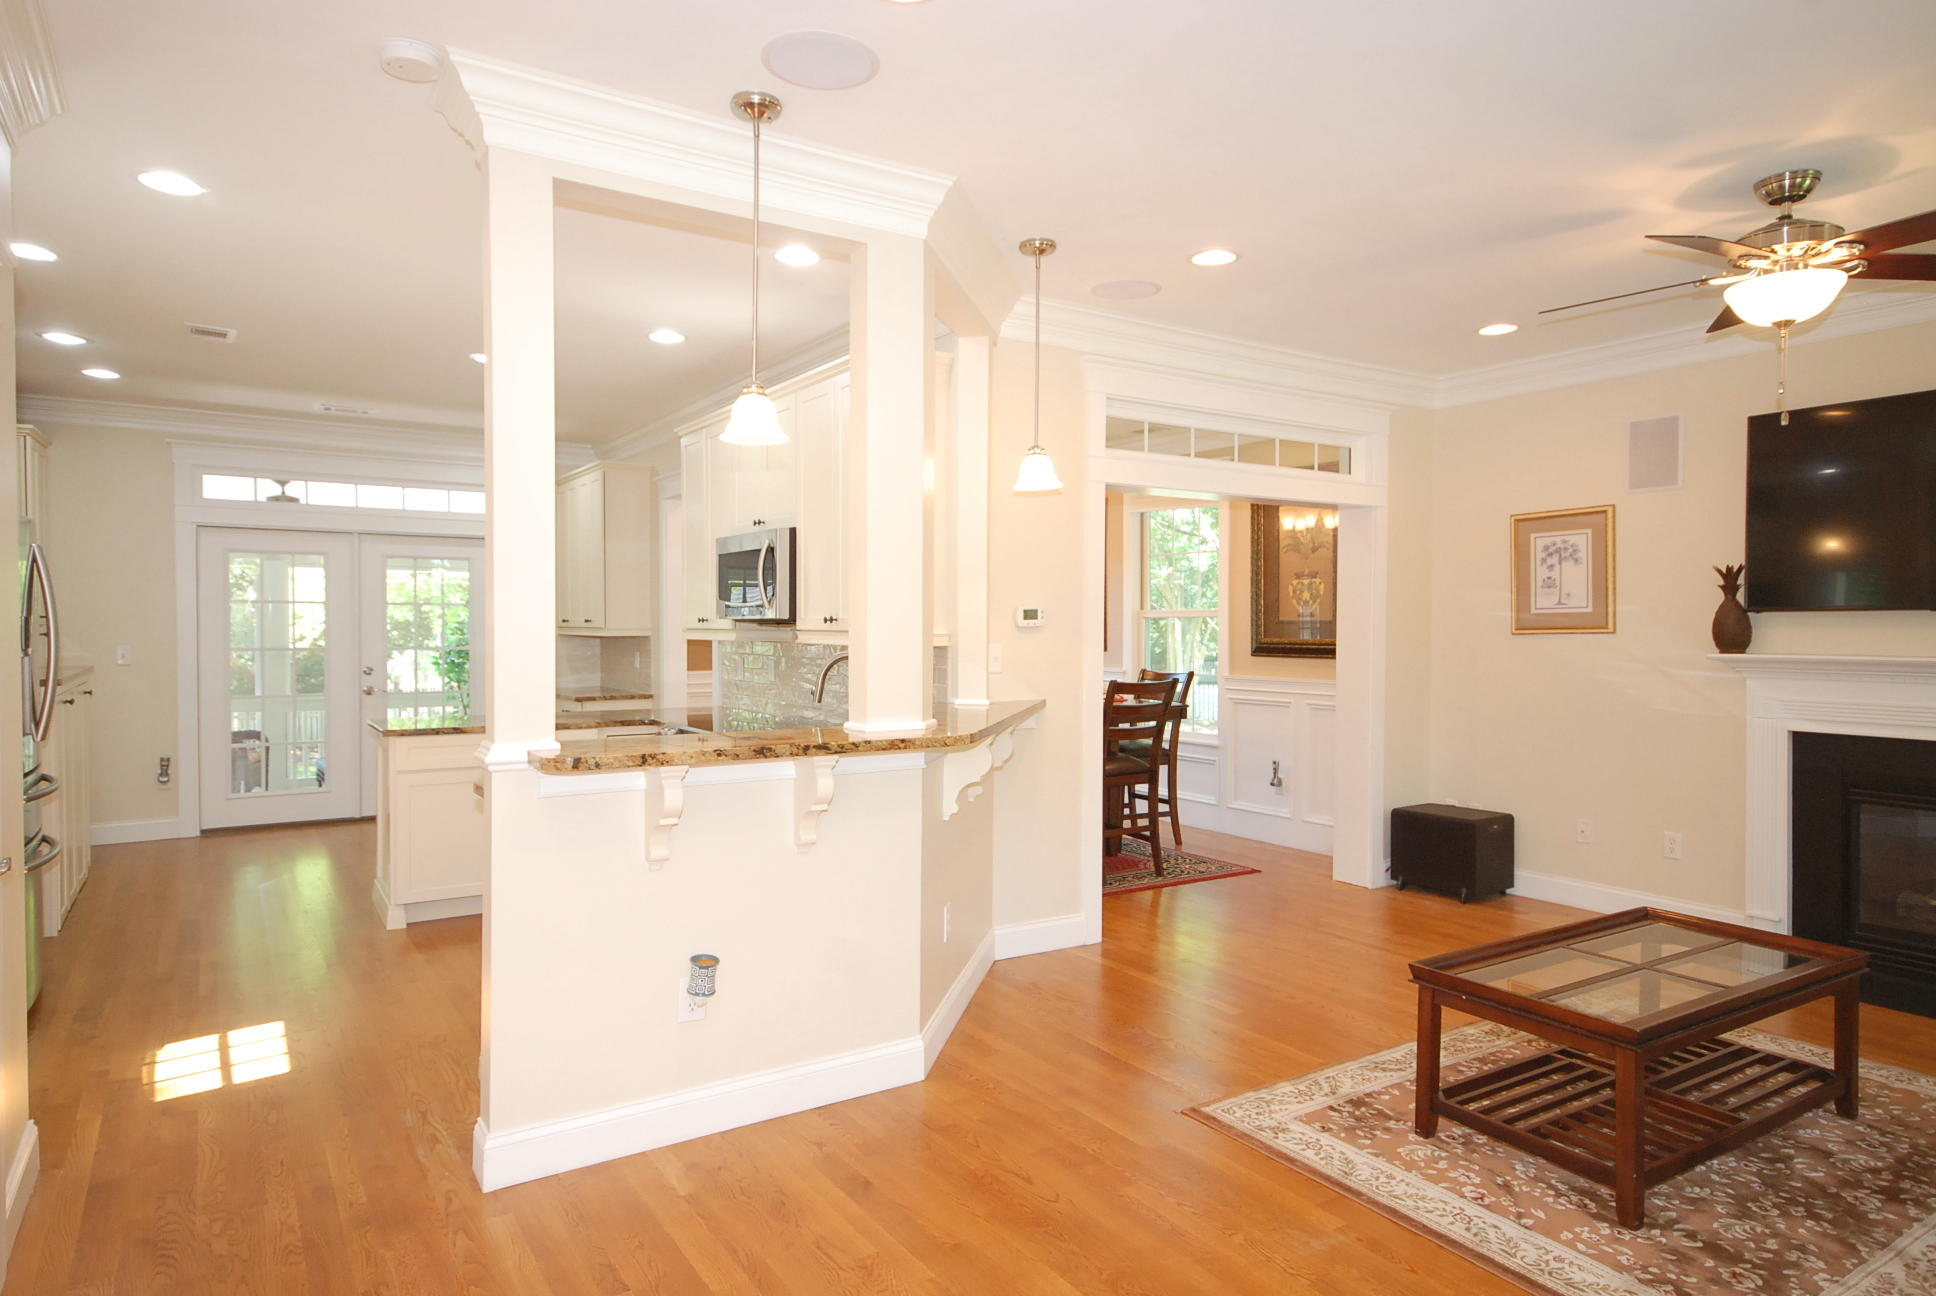 Daniel Island Homes For Sale - 100 Jordan, Daniel Island, SC - 15